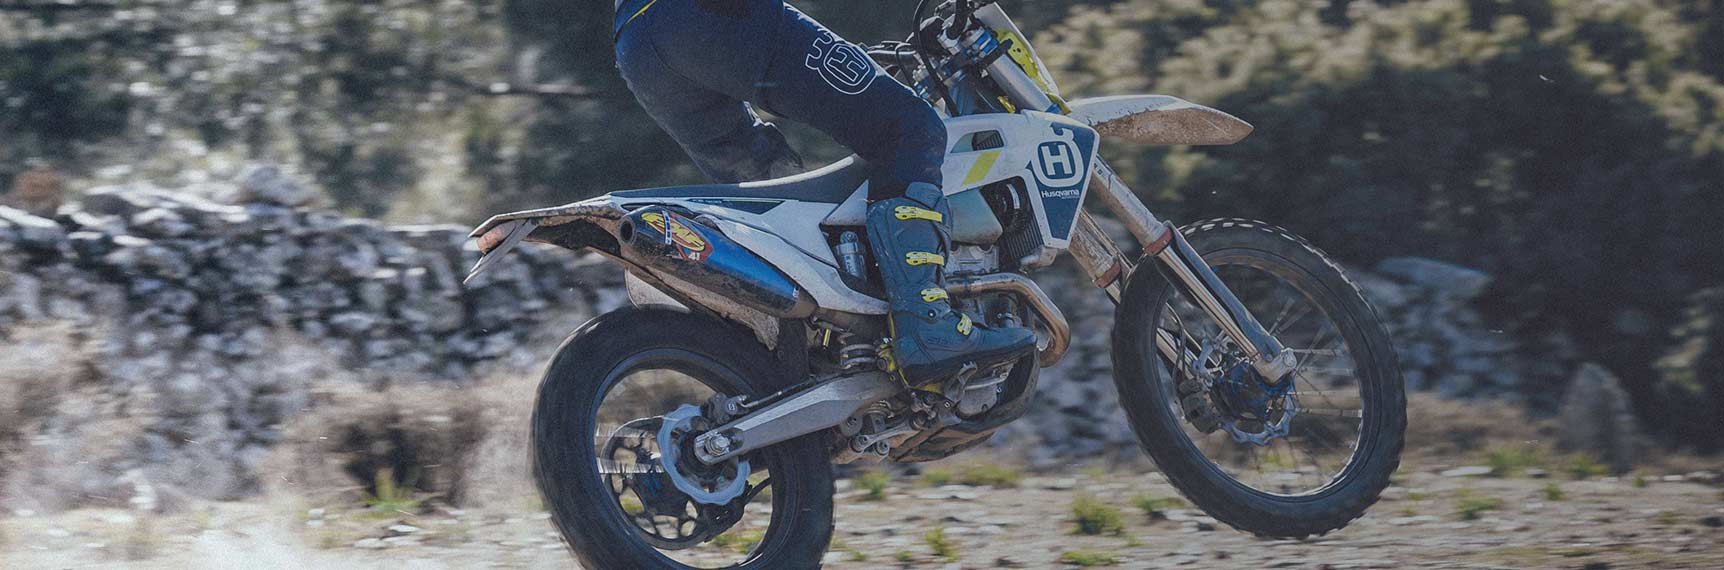 Husqvarna Bikes, 2022 Range - St Blazey MX